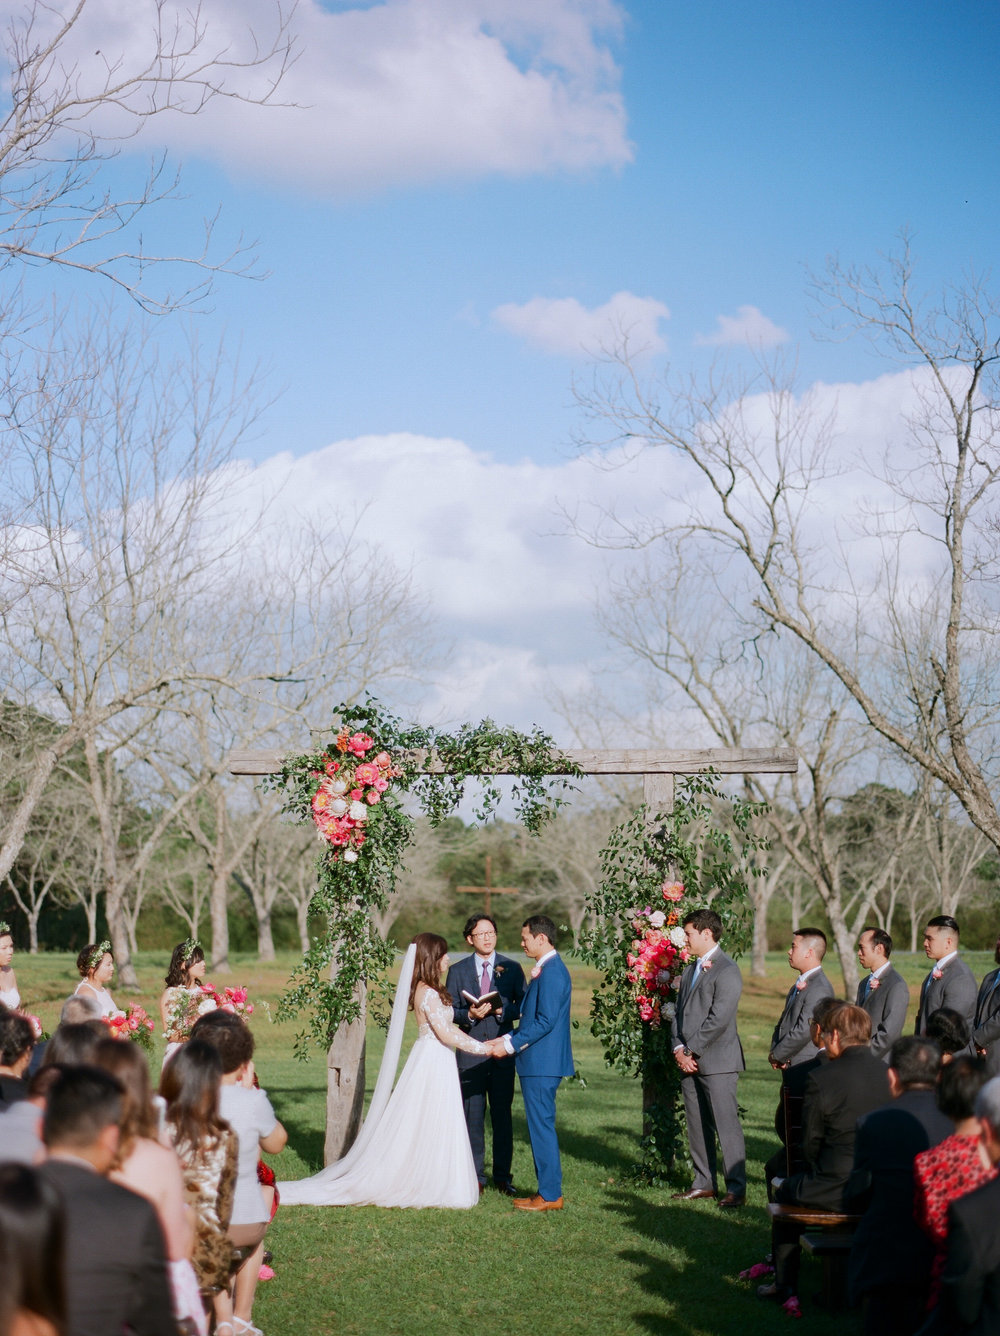 The-Knot-50-Weddings-50-States-Texas-Winner-Dana-Fernandez-photography-houston-wedding-photographer-film-fine-art-destination-28.jpg